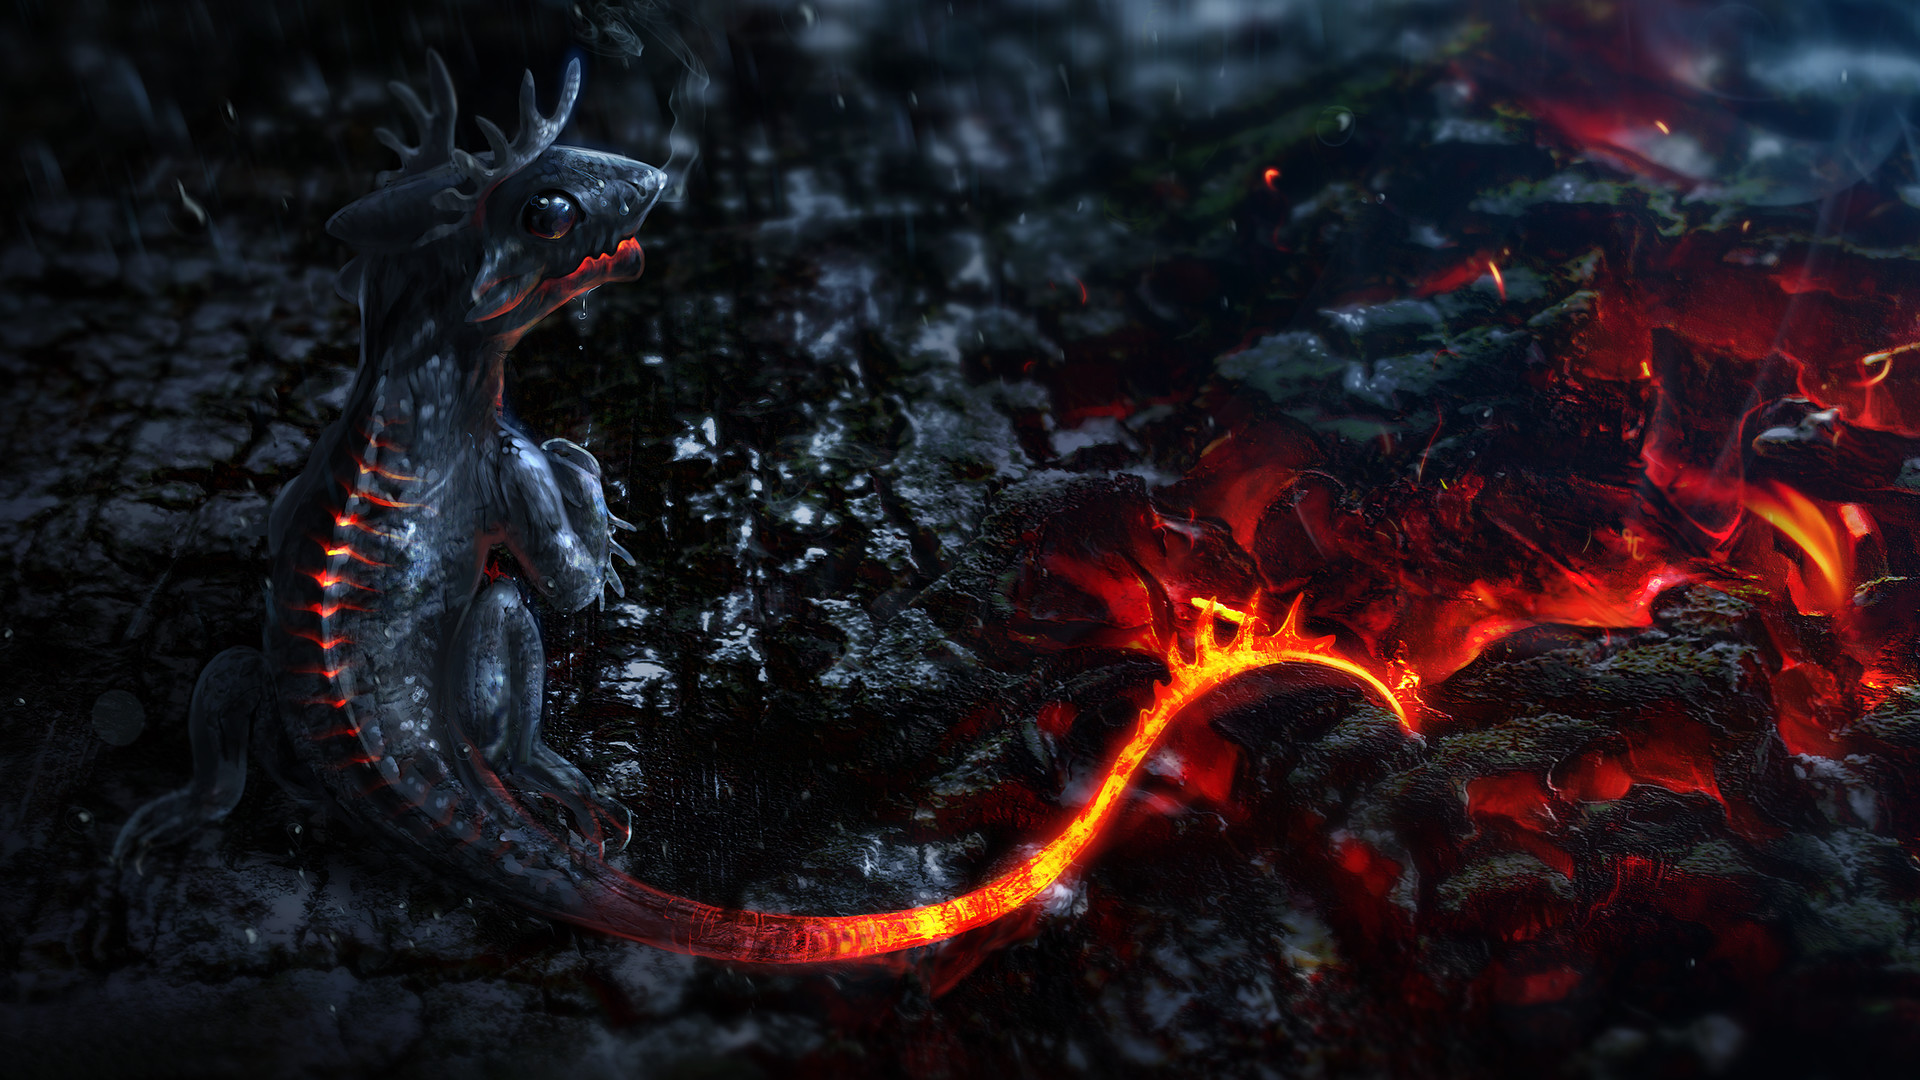 dragon-desktop-wallpaper_063723250_21.png (1920×1080) | dragons | Pinterest  | Wallpaper, Dragons and Fantasy dragon